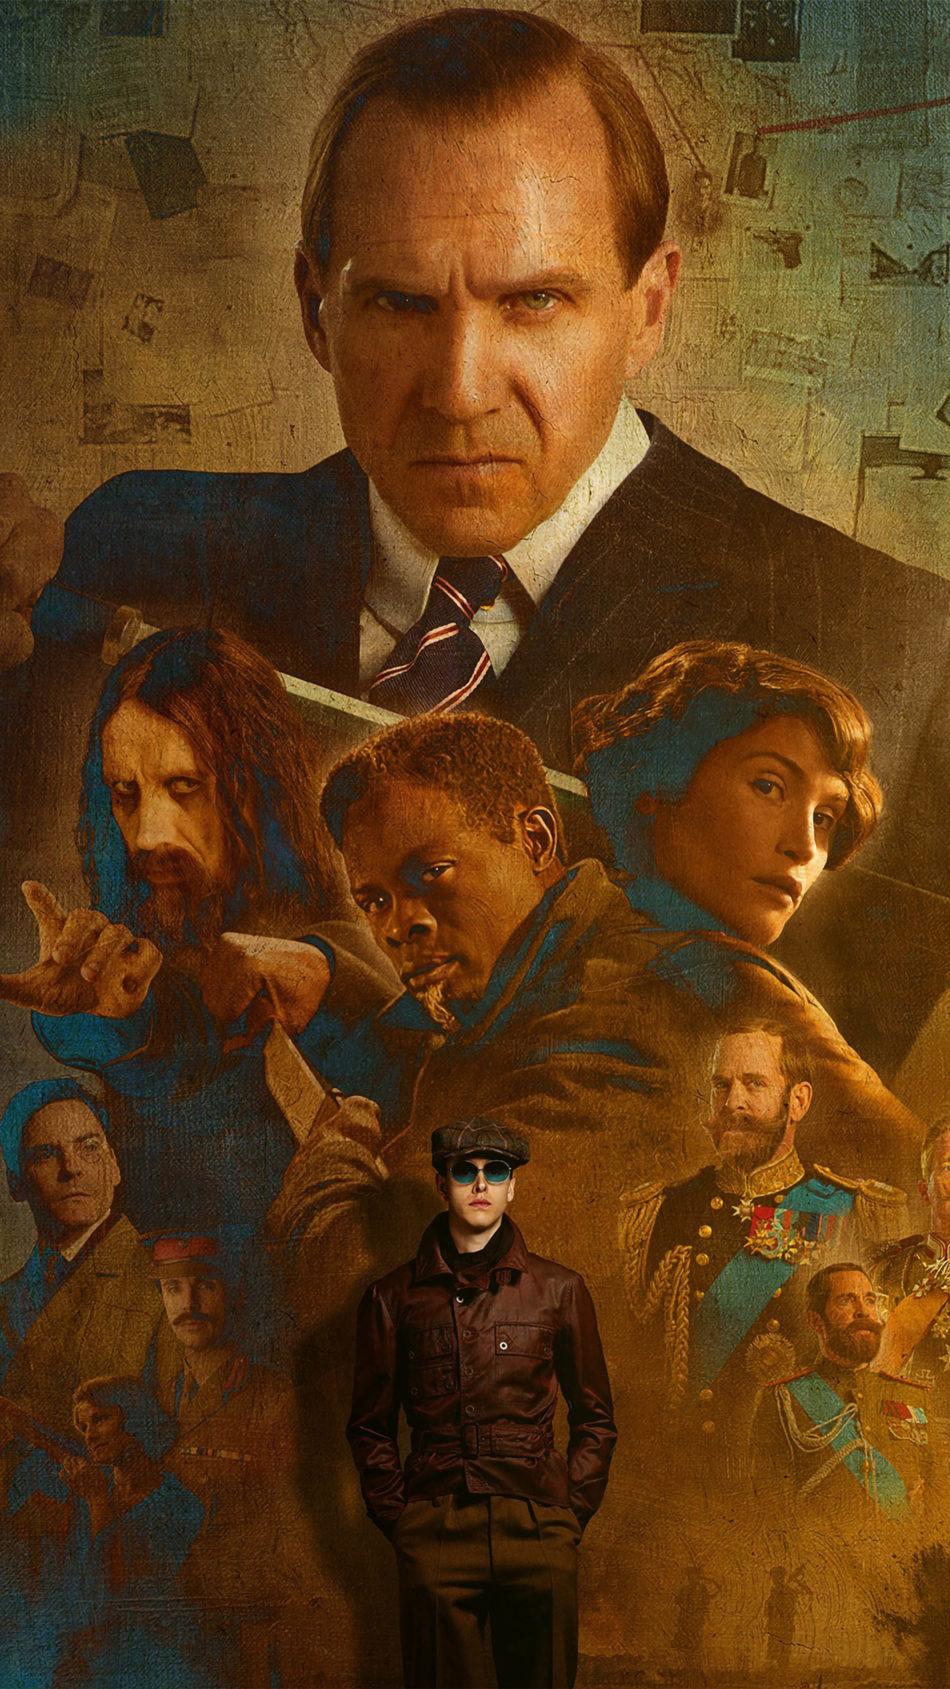 The King's Man 2020 Poster 4K Ultra HD Mobile Wallpaper